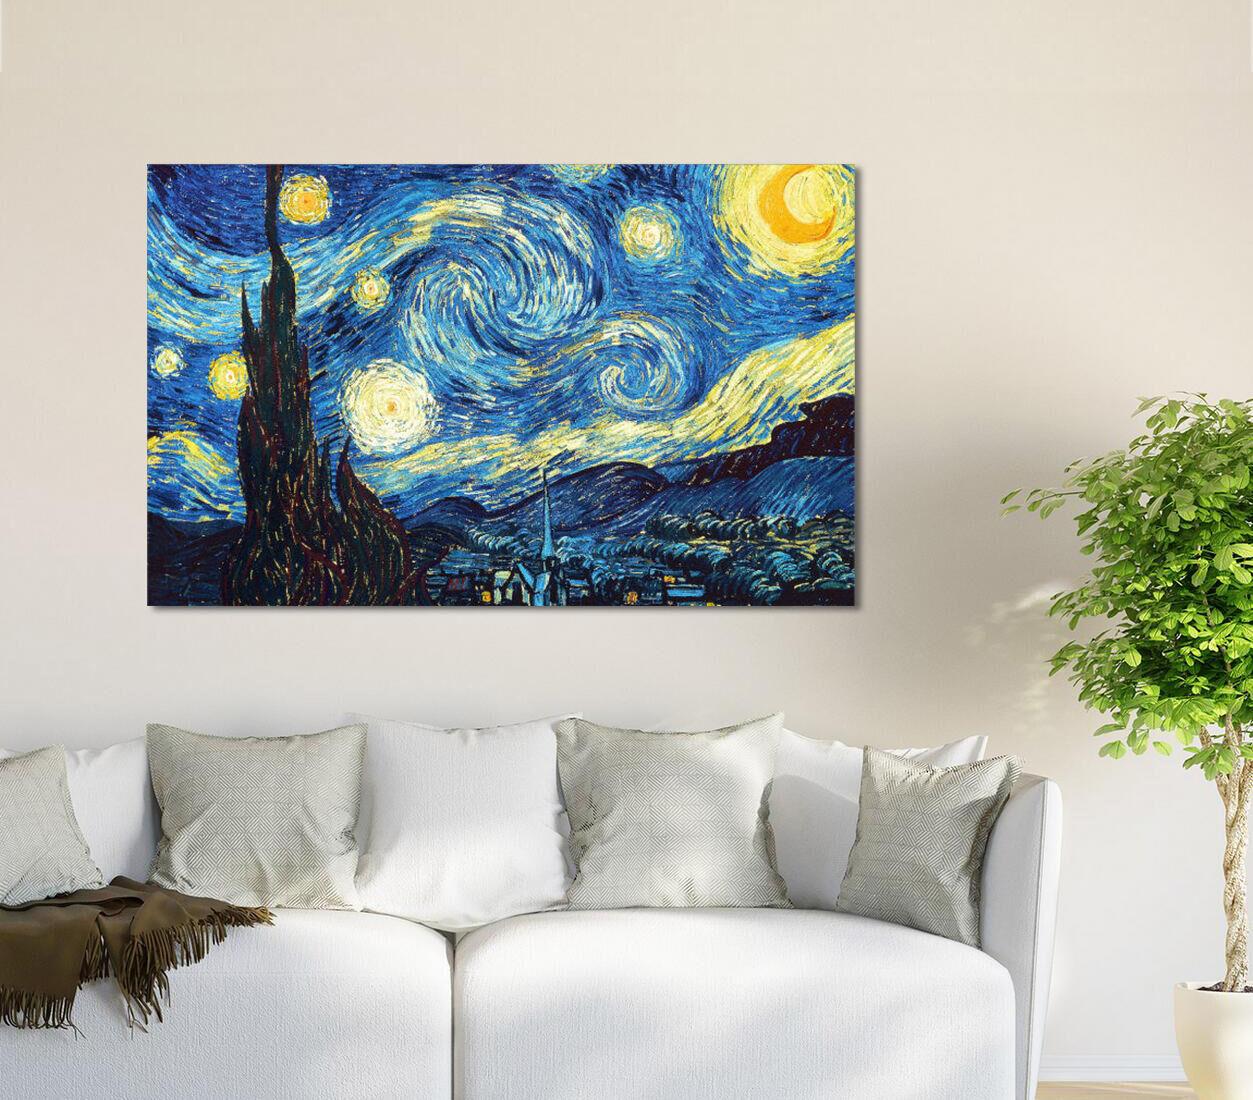 3D Van Gogh Ölgemälde Poster 78 Fototapeten Wandbild BildTapete AJSTORE DE Lemon | Verschiedene aktuelle Designs  | Vogue  | Einfach zu spielen, freies Leben